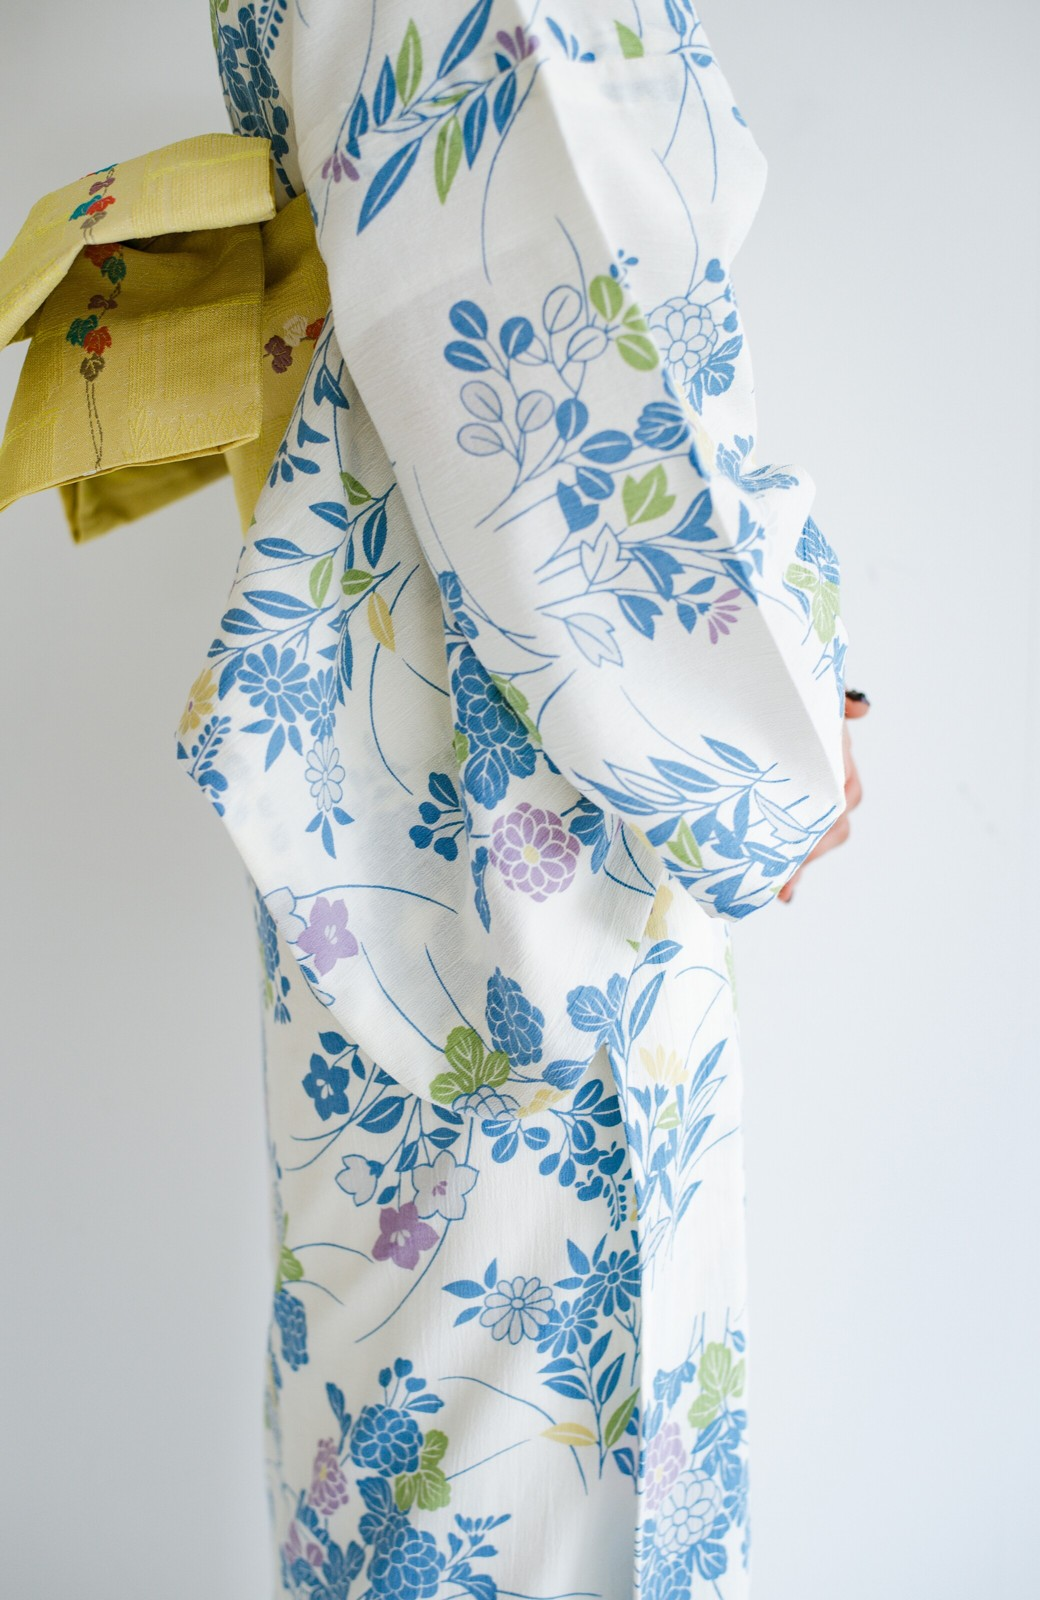 haco! ひでや工房 京都の綿ちりめん浴衣 <サックスブルー>の商品写真6